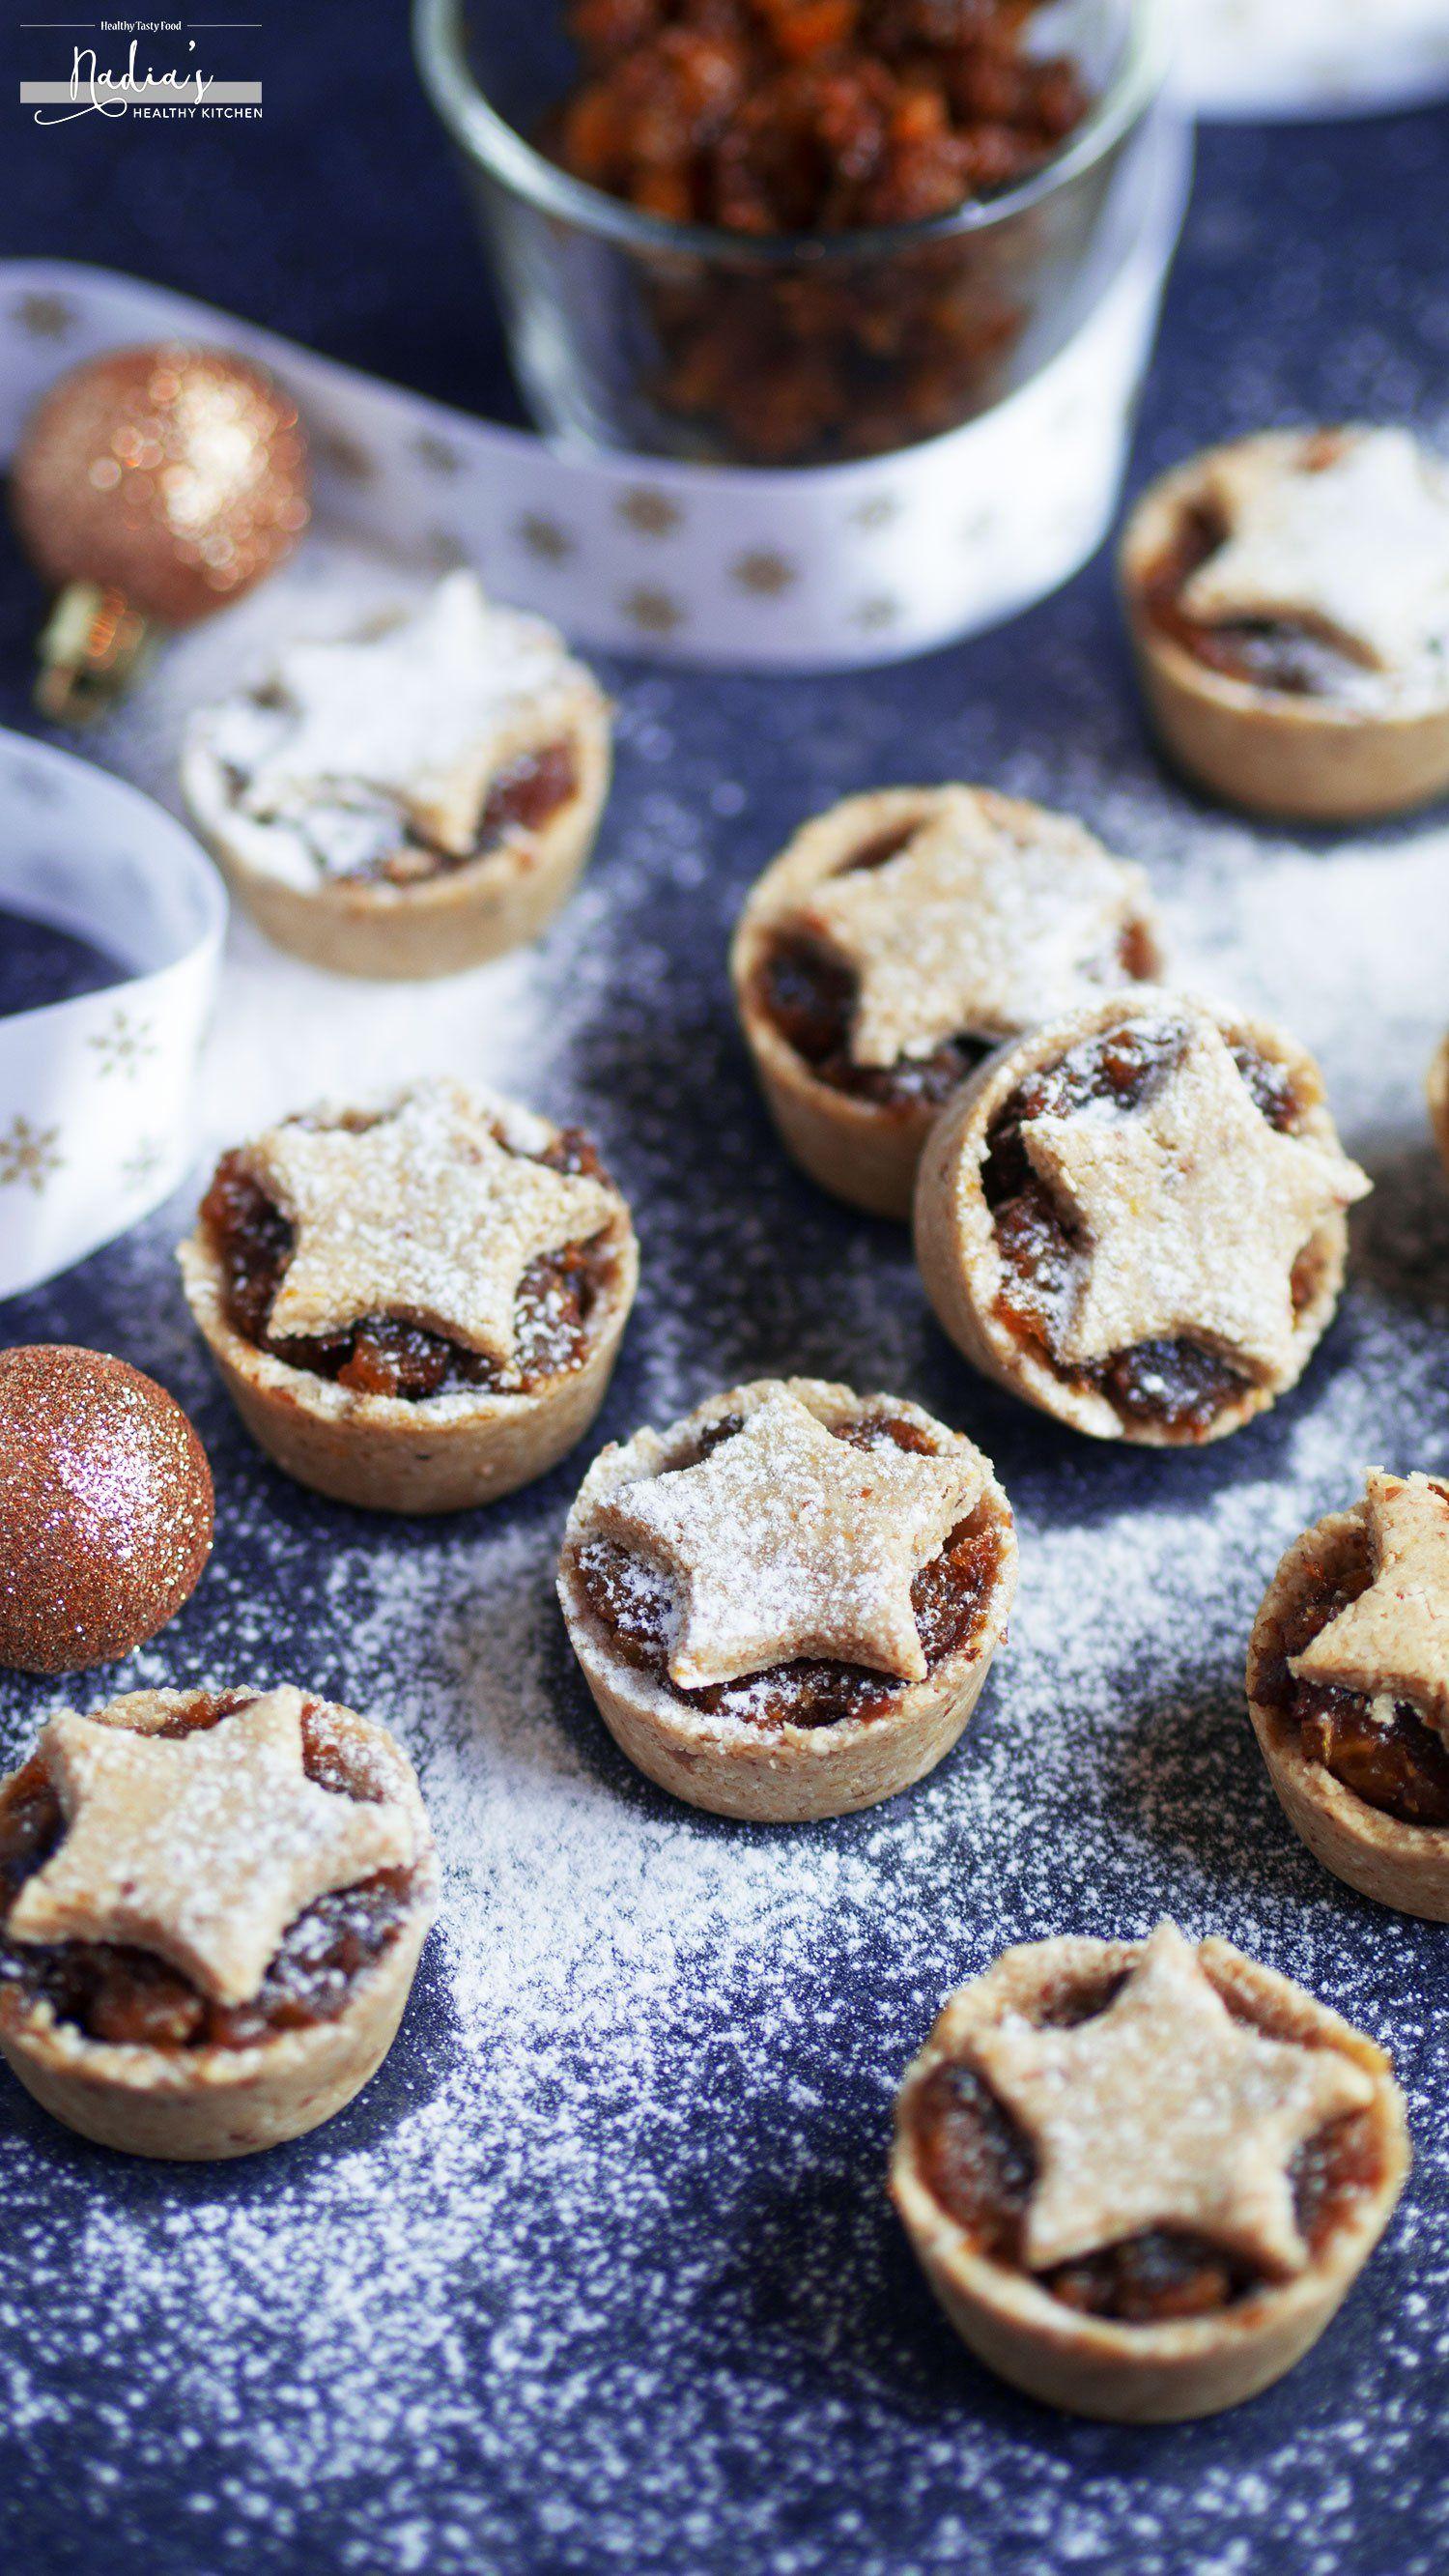 Raw mince pies recipe vegan gluten free this is my first raw mince pies recipe vegan gluten free this is my first christmas recipe forumfinder Images